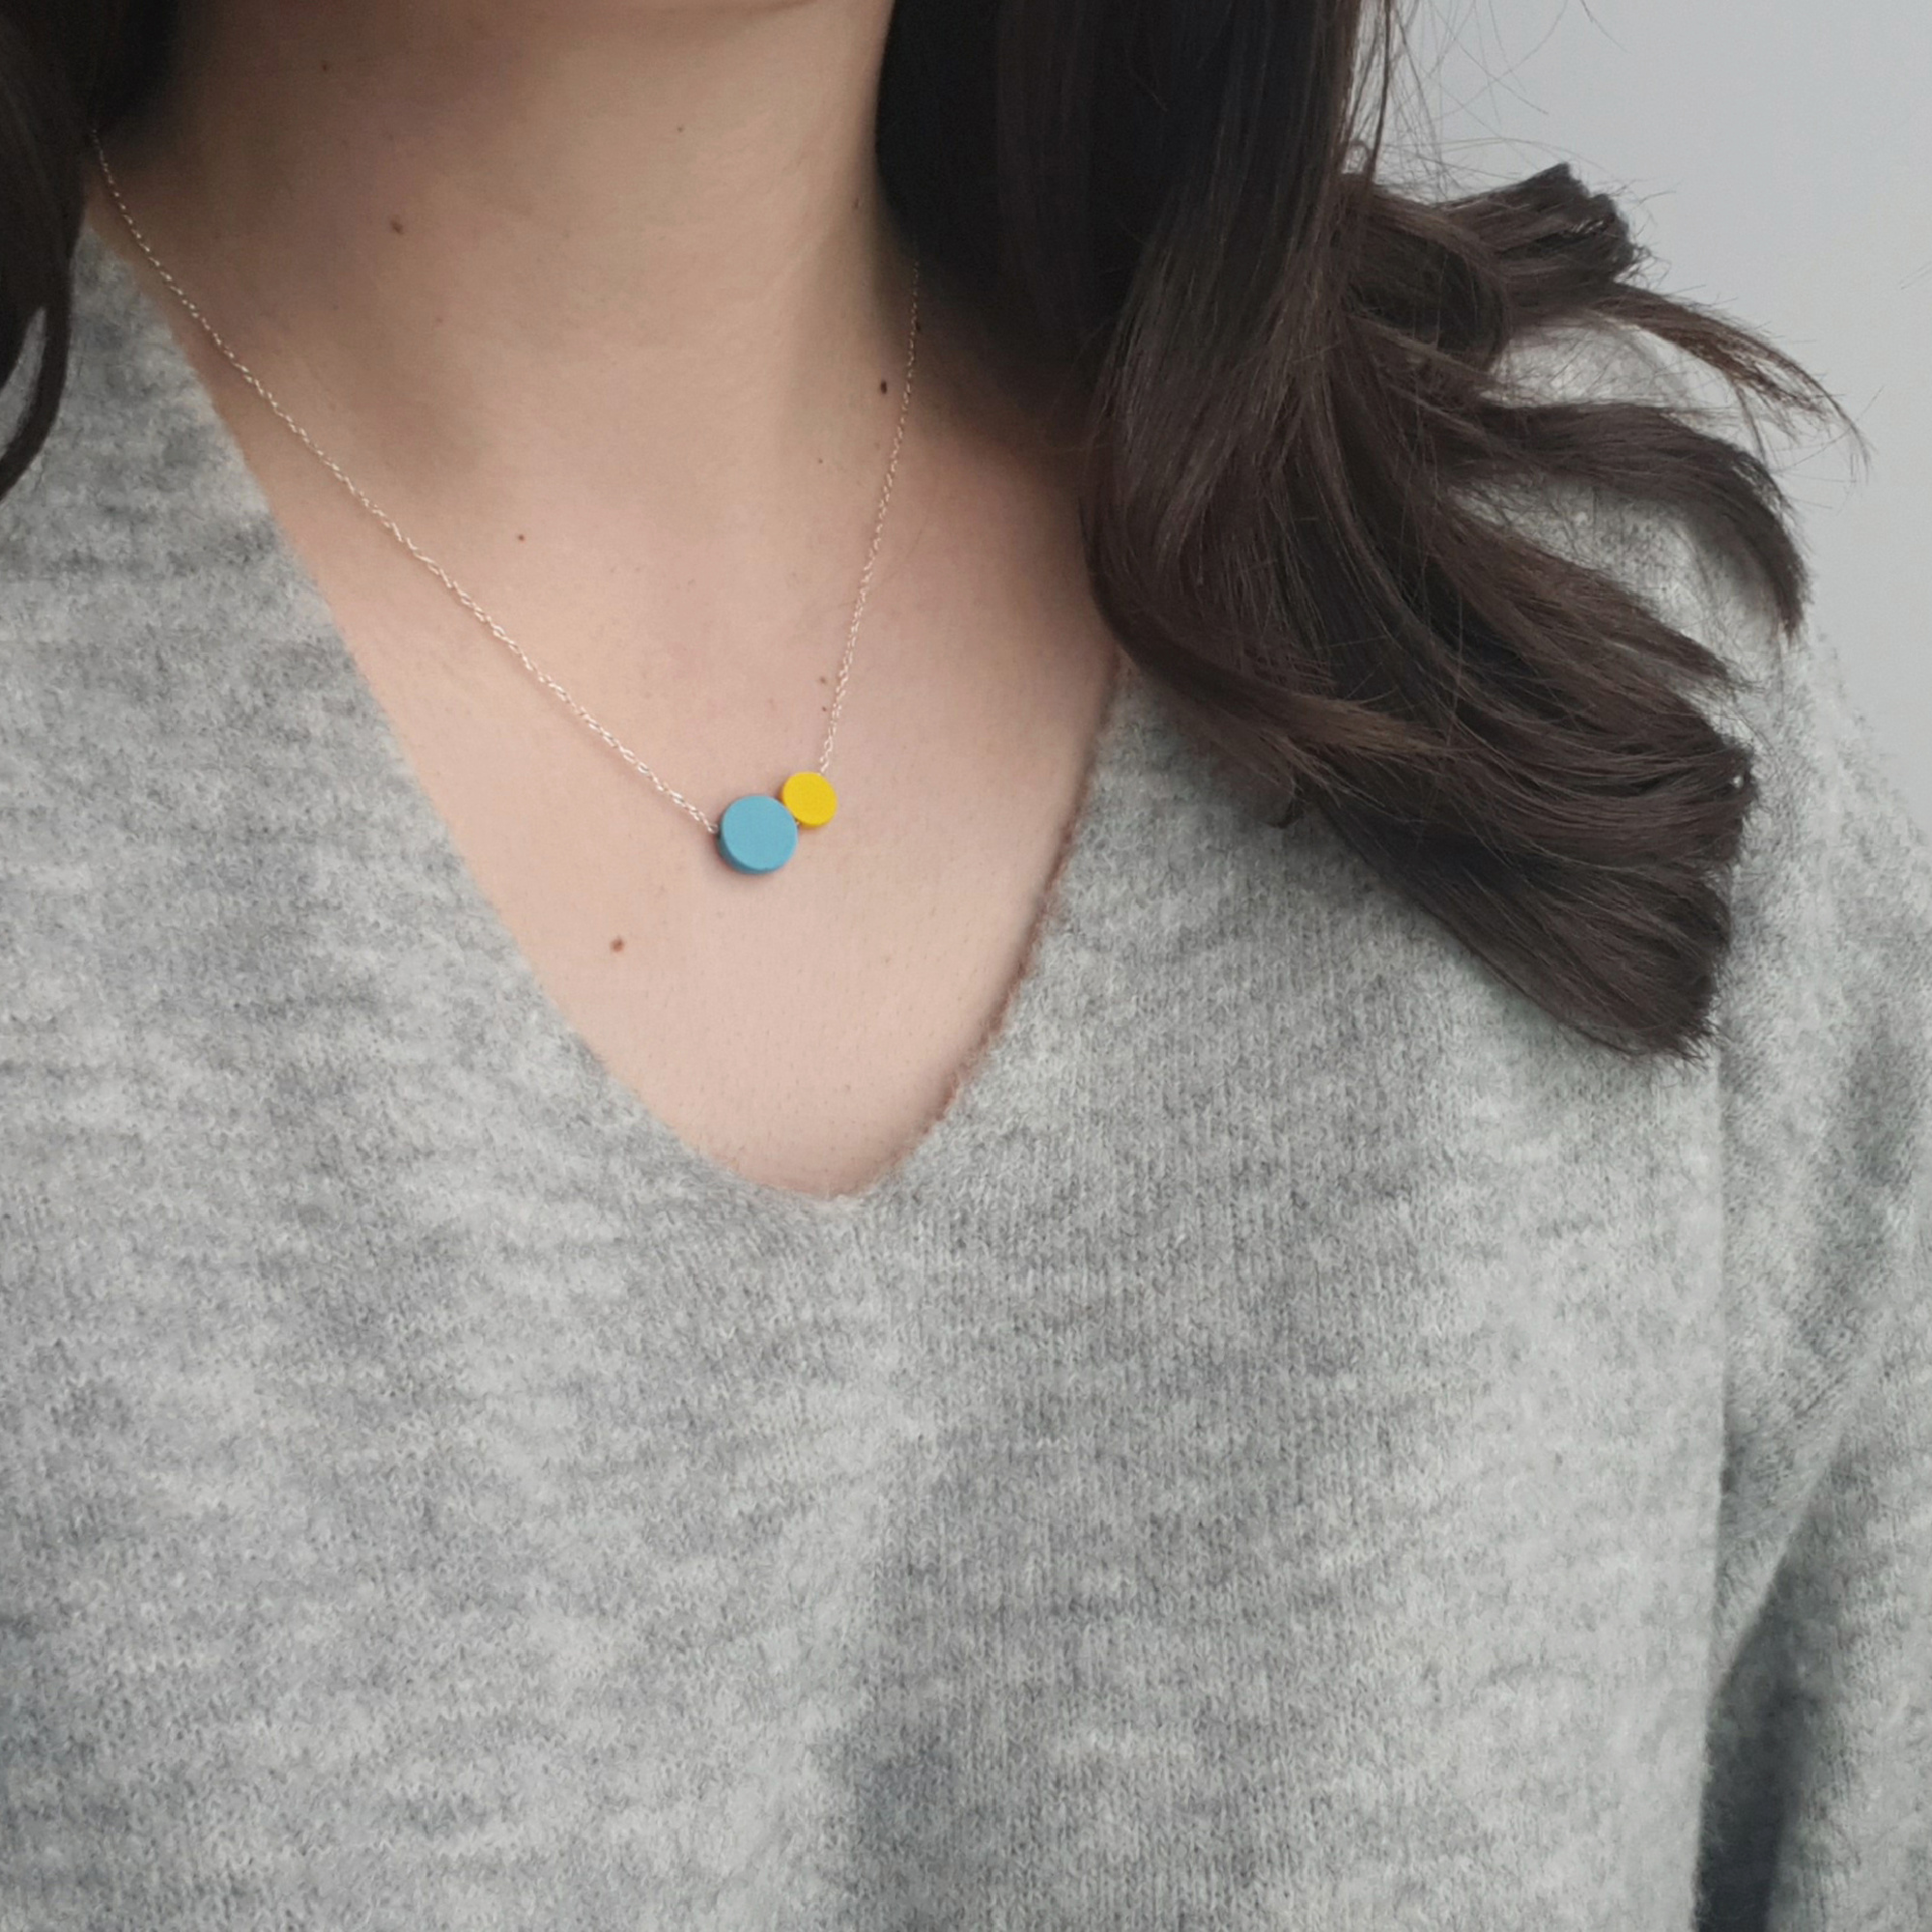 Dottie Ceramic Necklace by Beth Lamont